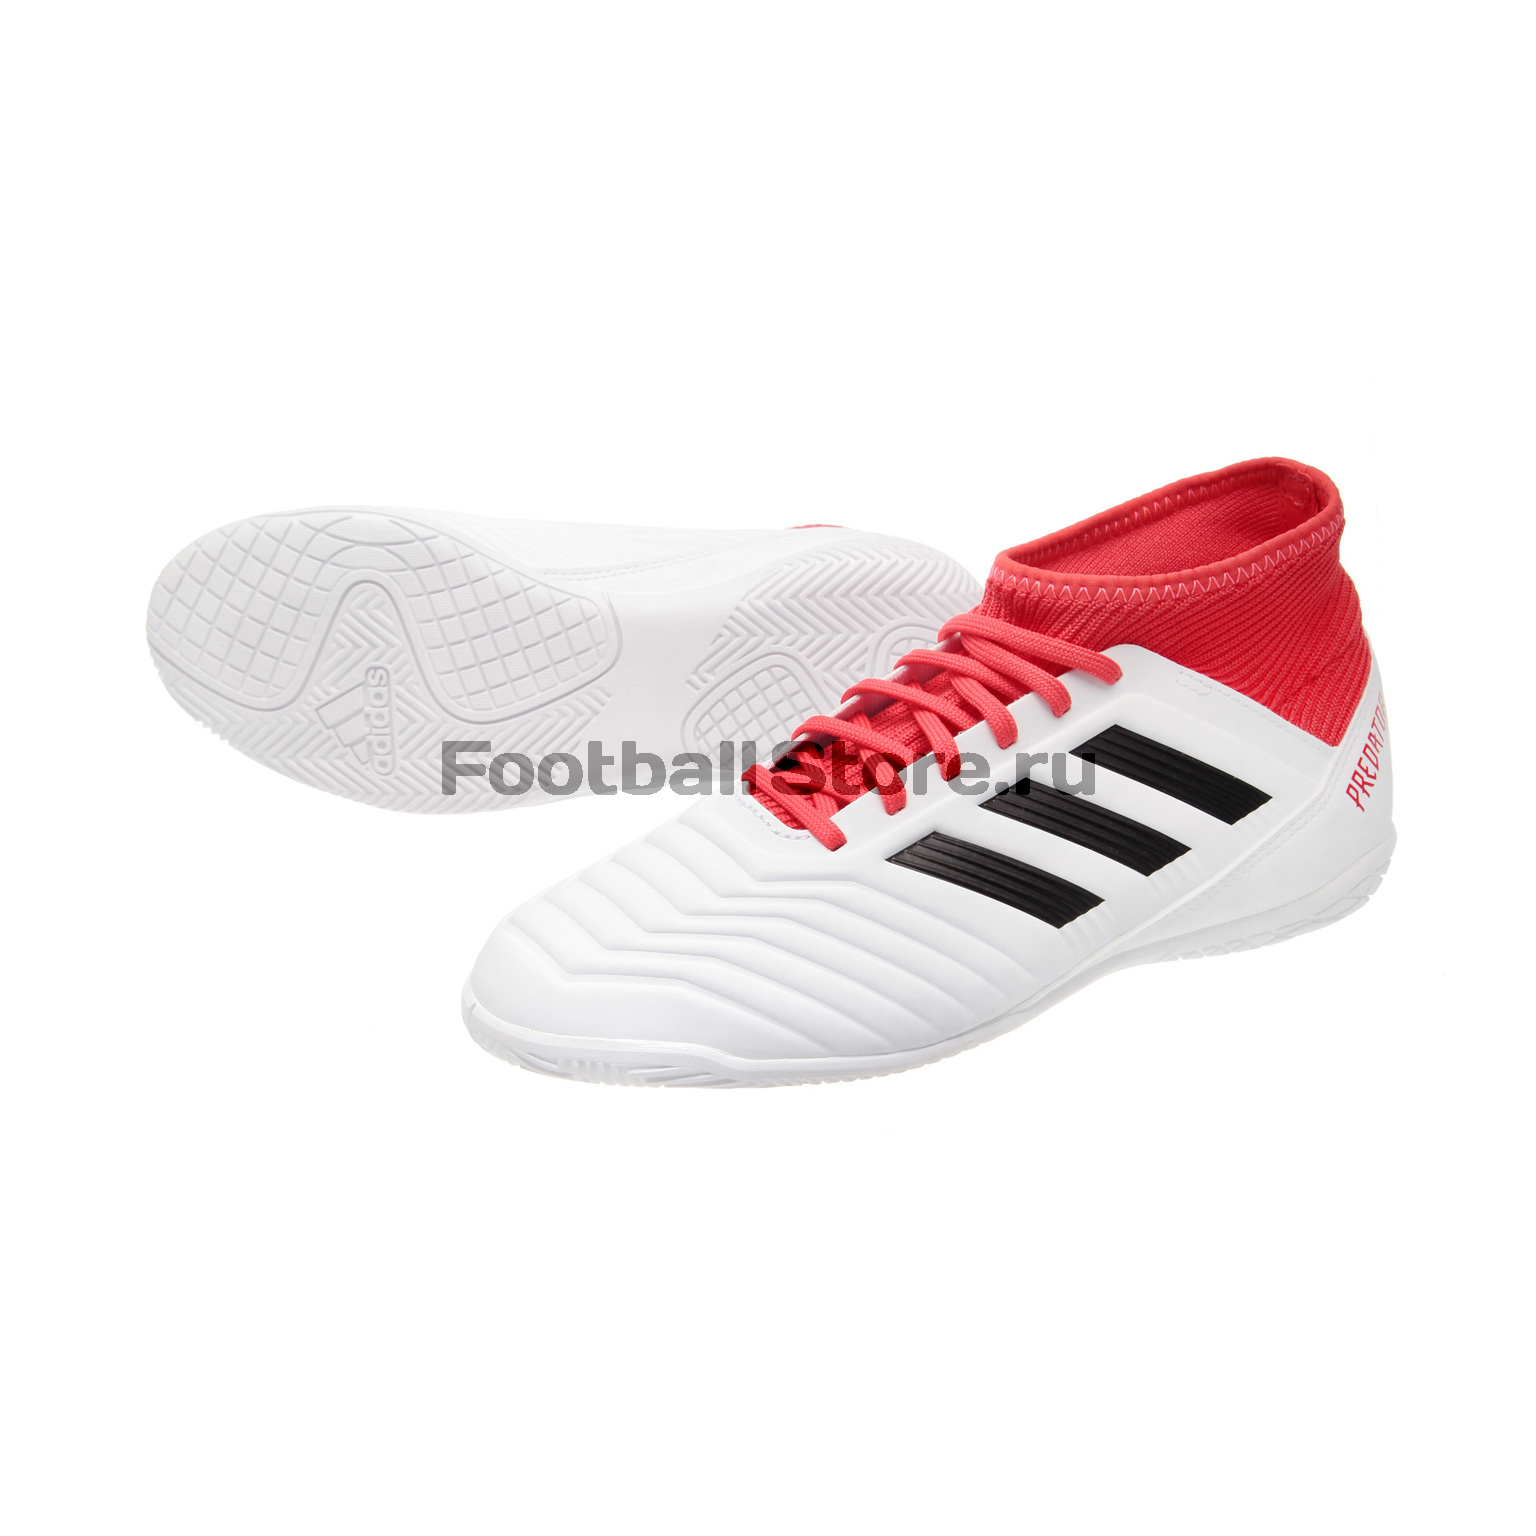 Обувь для зала Adidas Predator Tango 18.3 IN JR CP9073 обувь для зала adidas ace tango 18 3 in jr cp9075